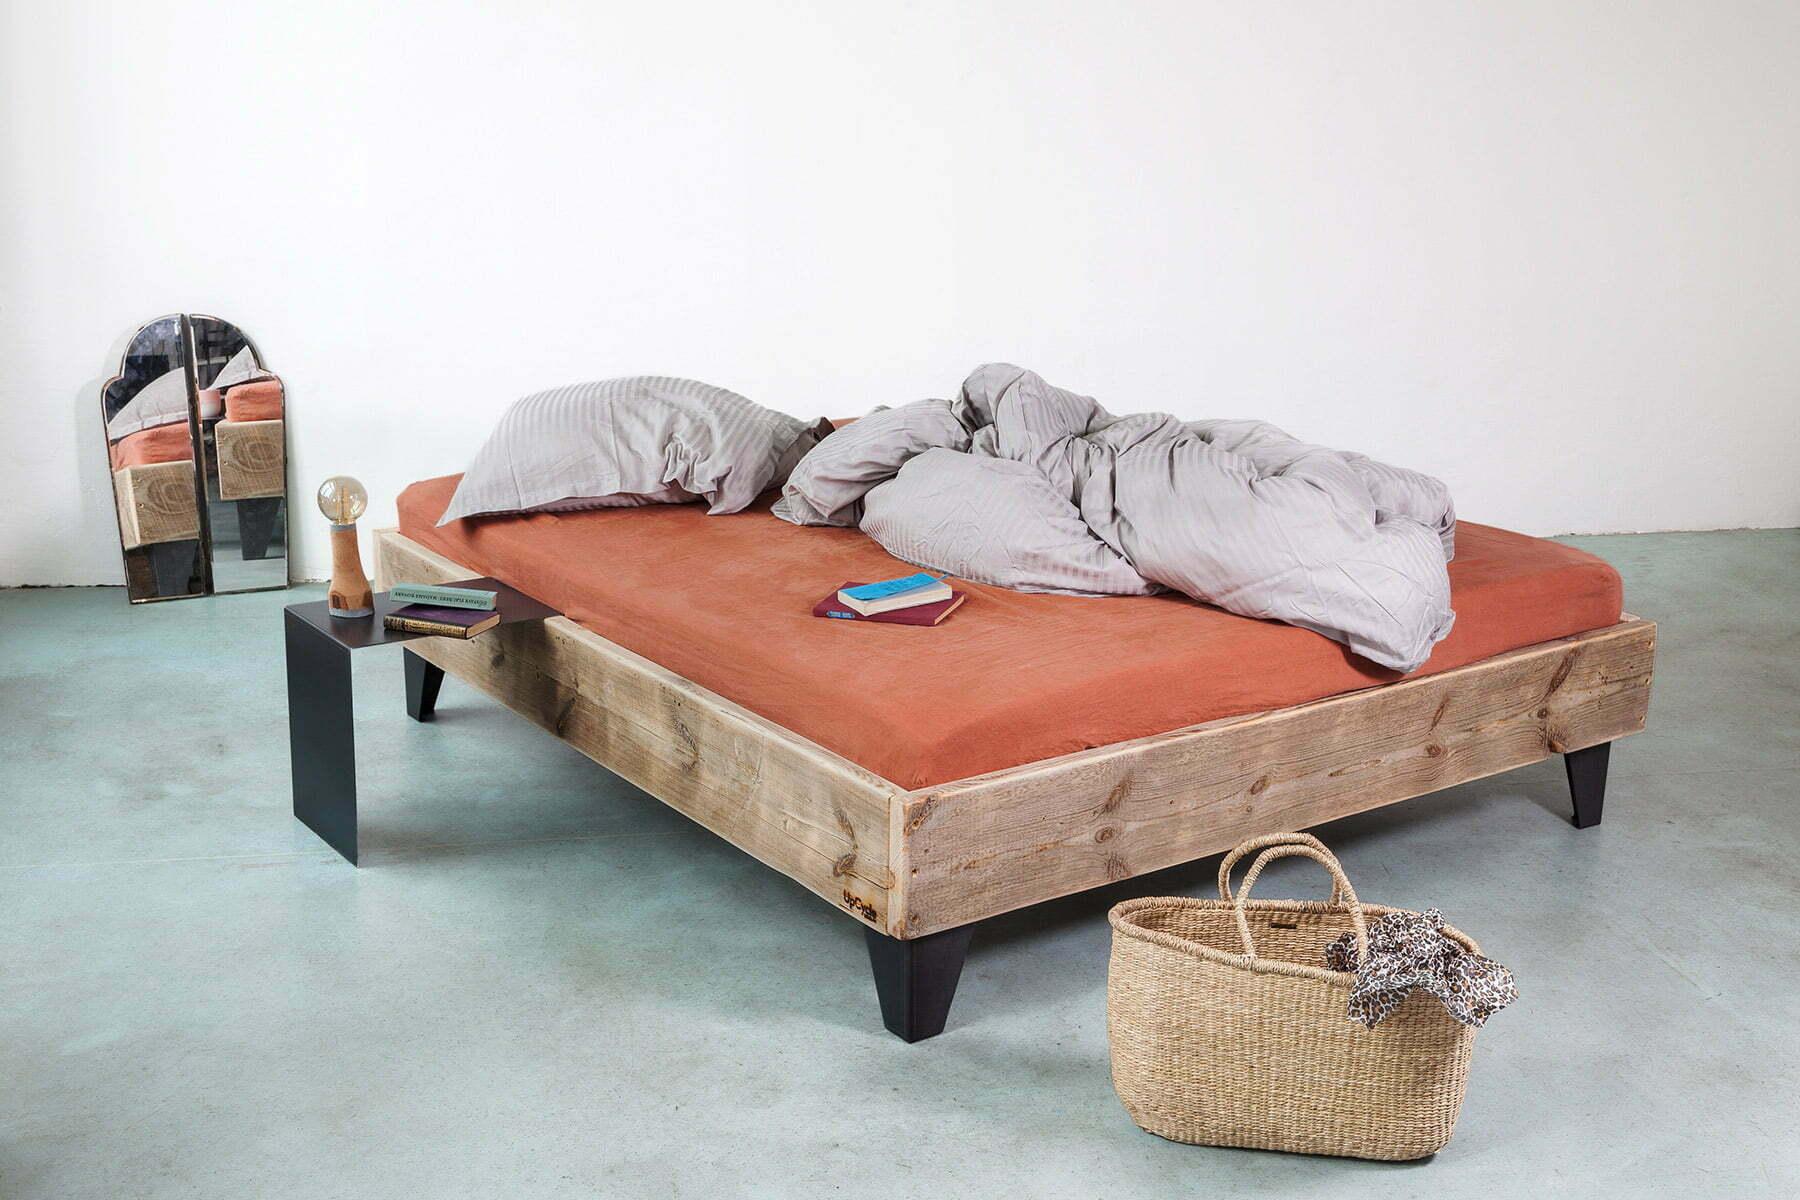 UpCycle-Berlin-Bett-Model-AMIT-aus-Bauholz-Spiegel-Metall-Nachttisch